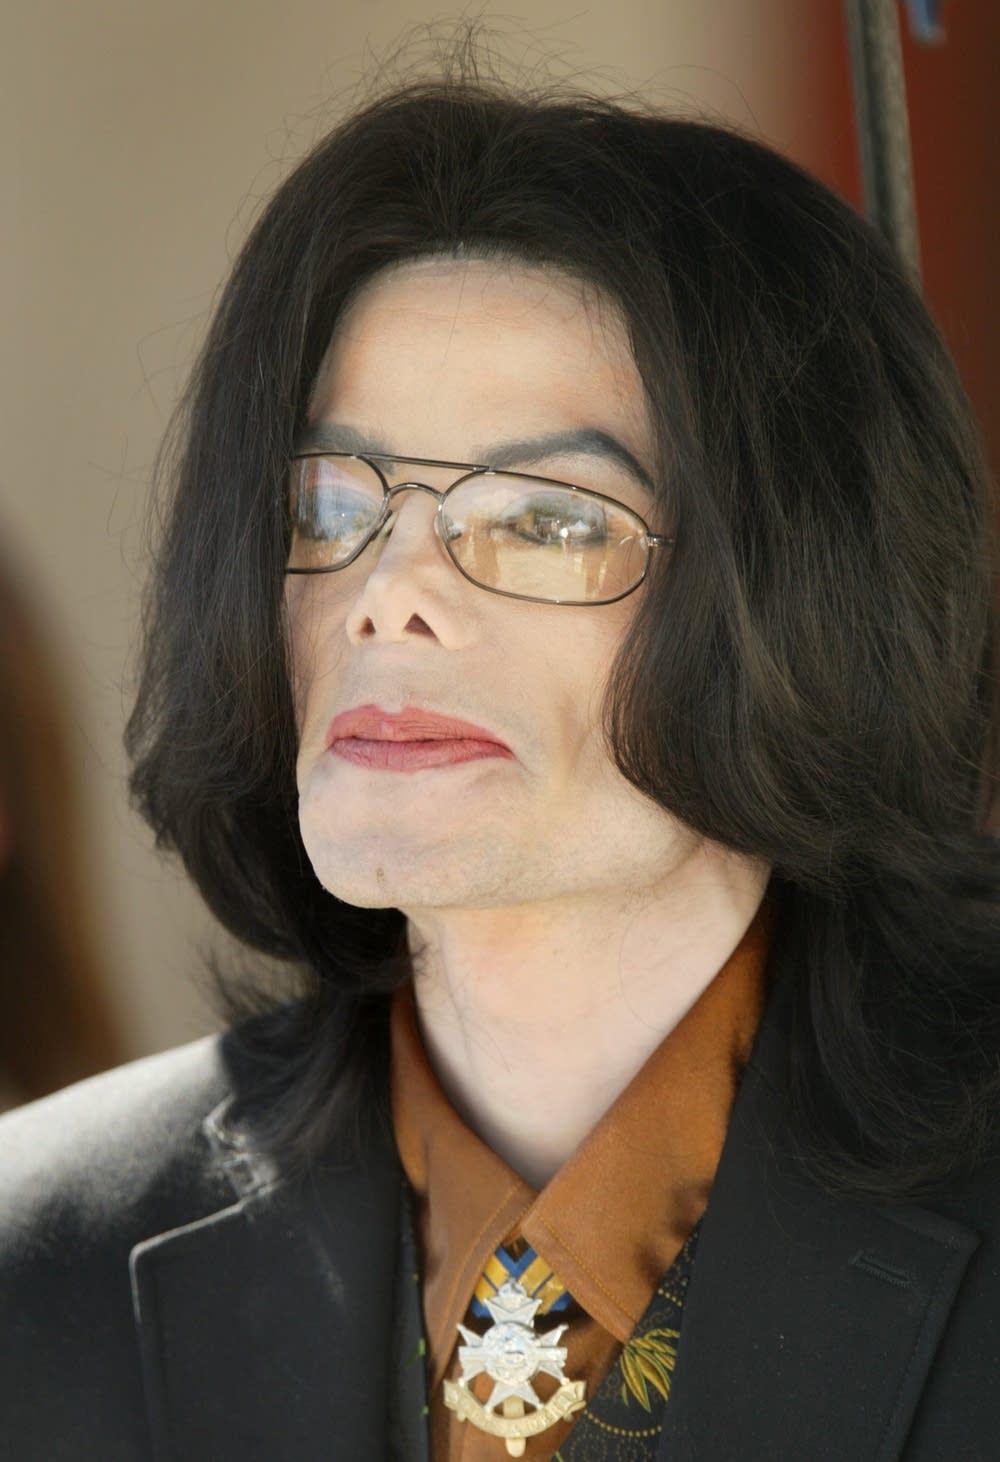 When Michael Jackson died 1